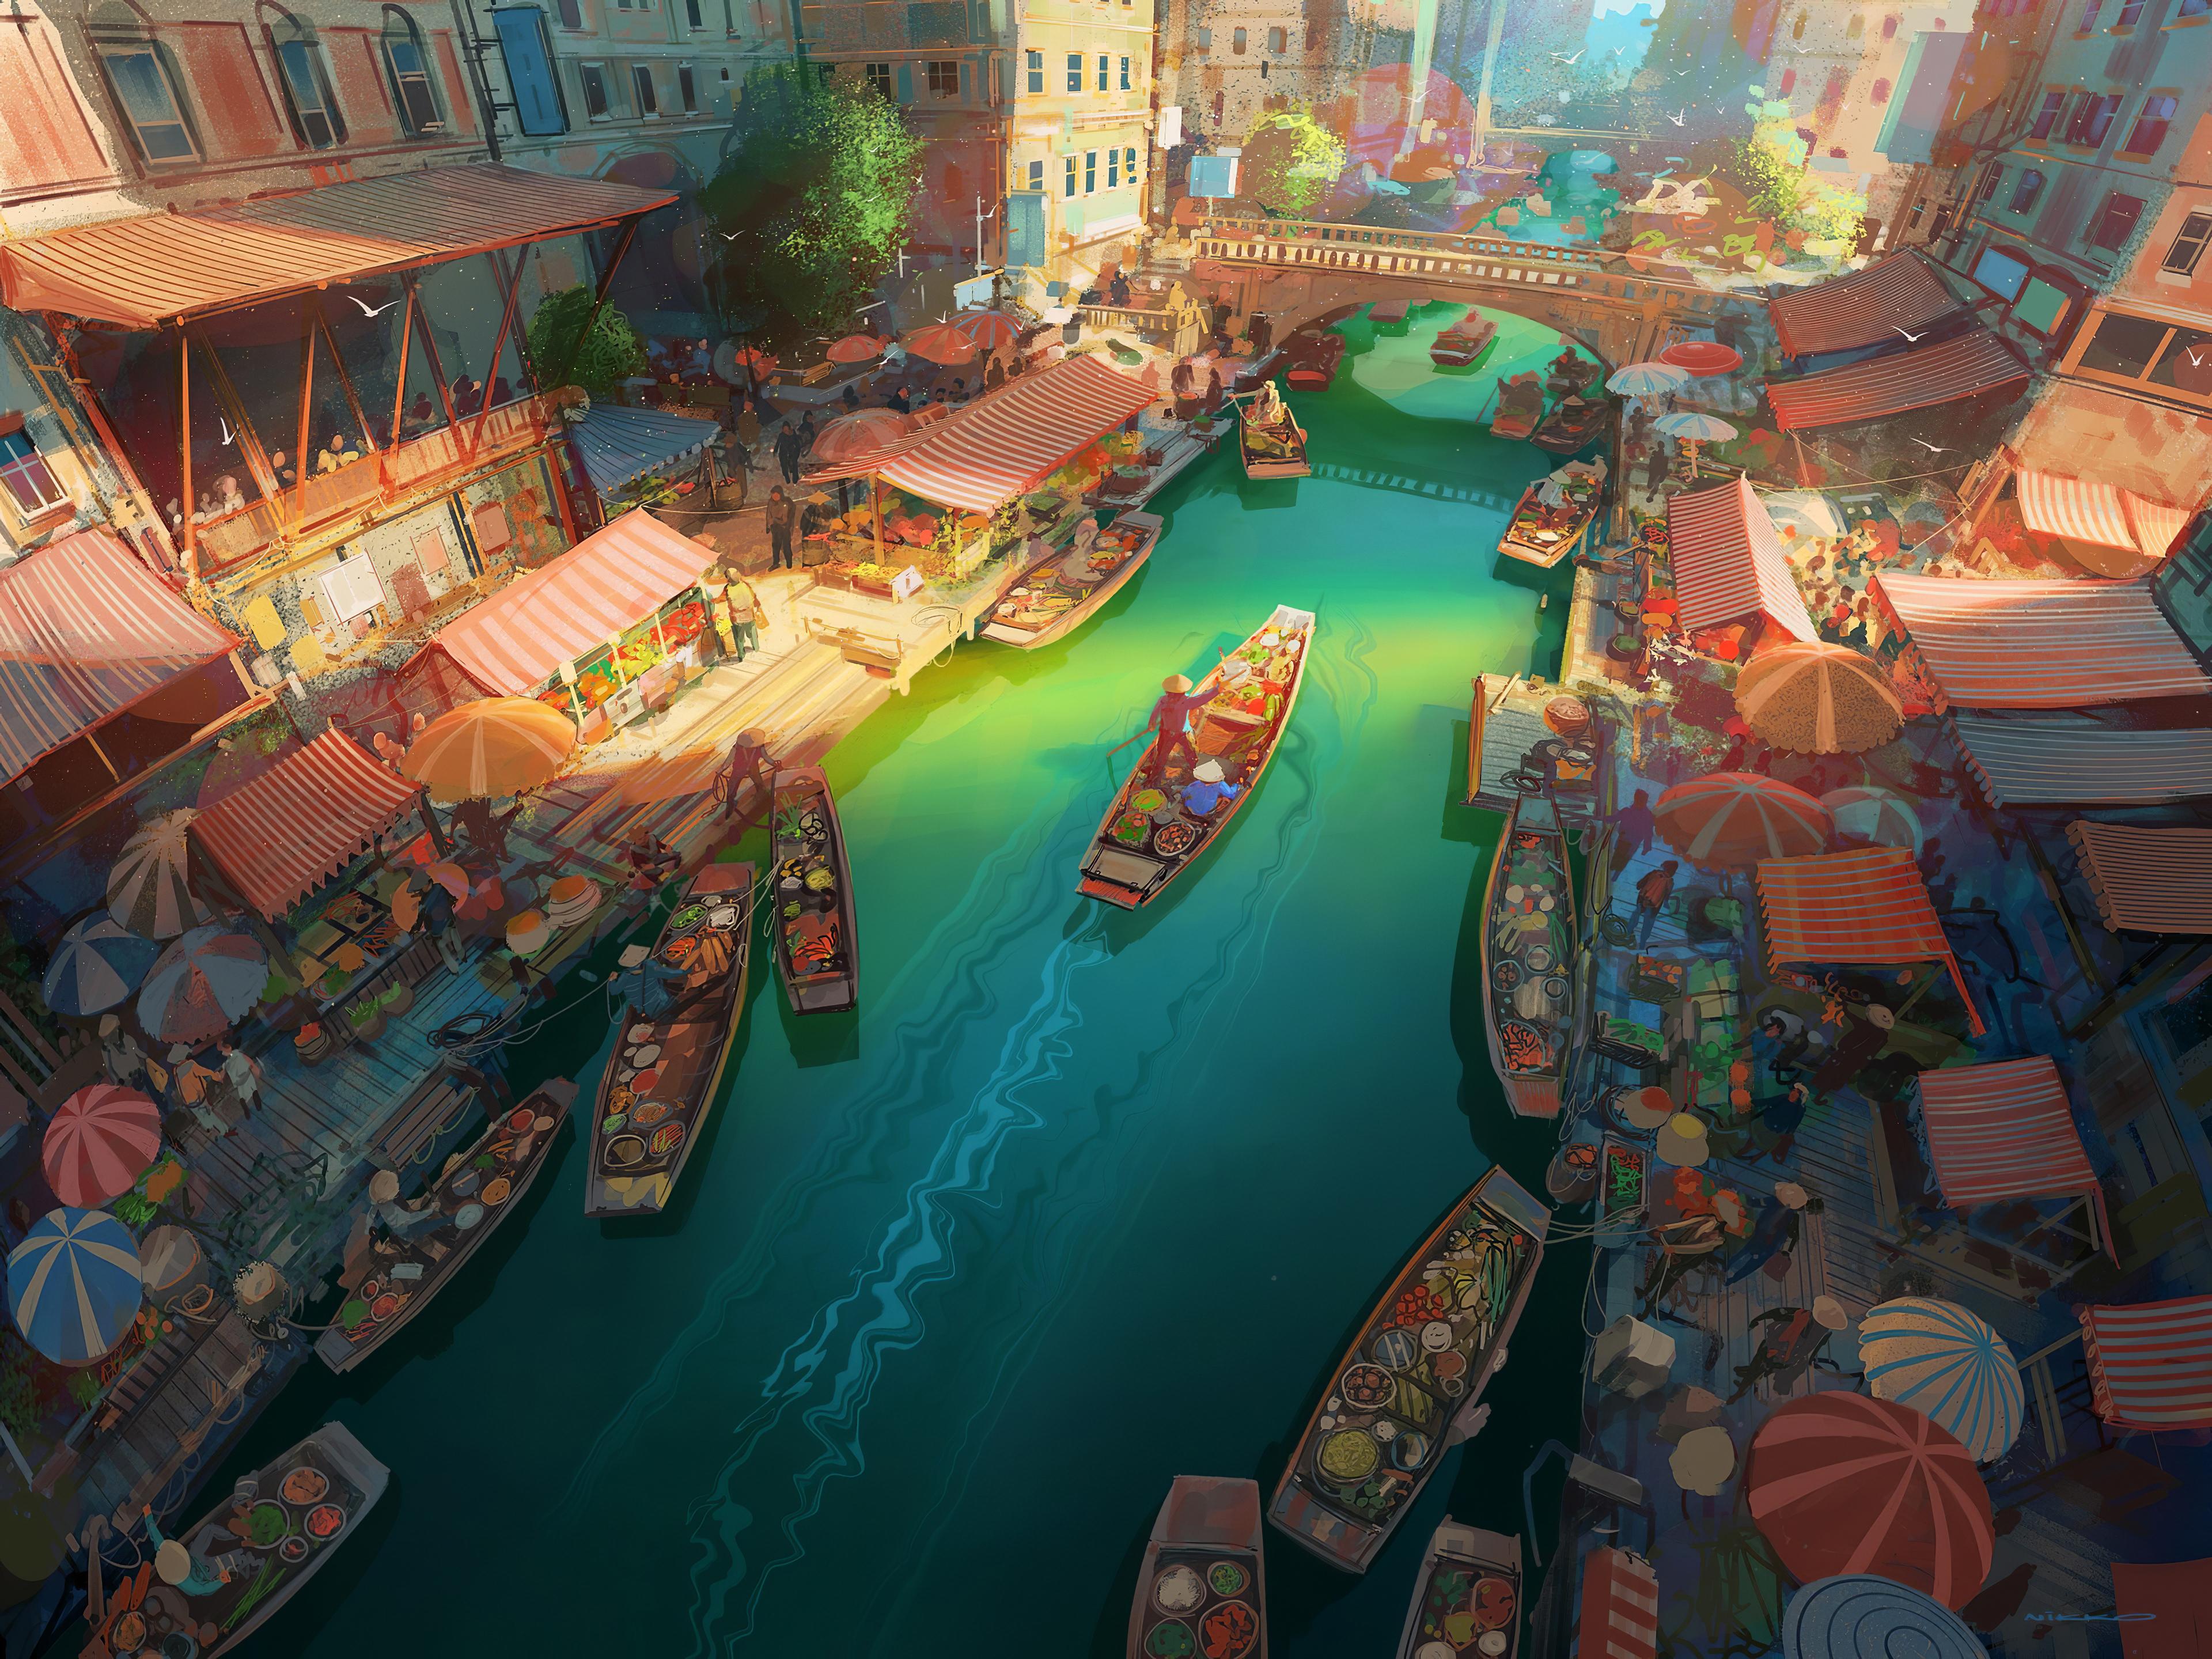 green river city 1574940985 - Green River City -